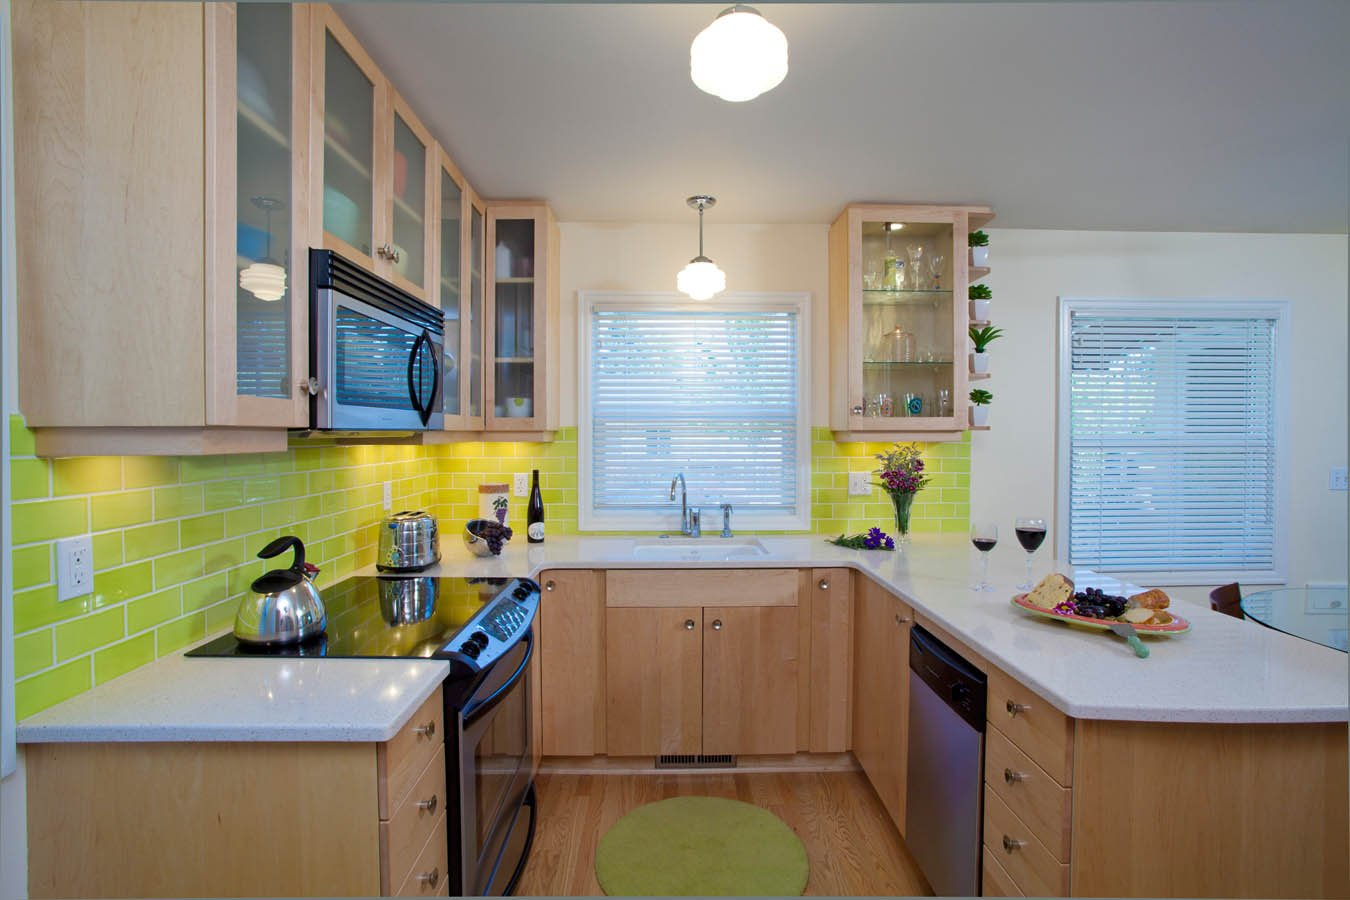 Retro-Transitional kitchen concept